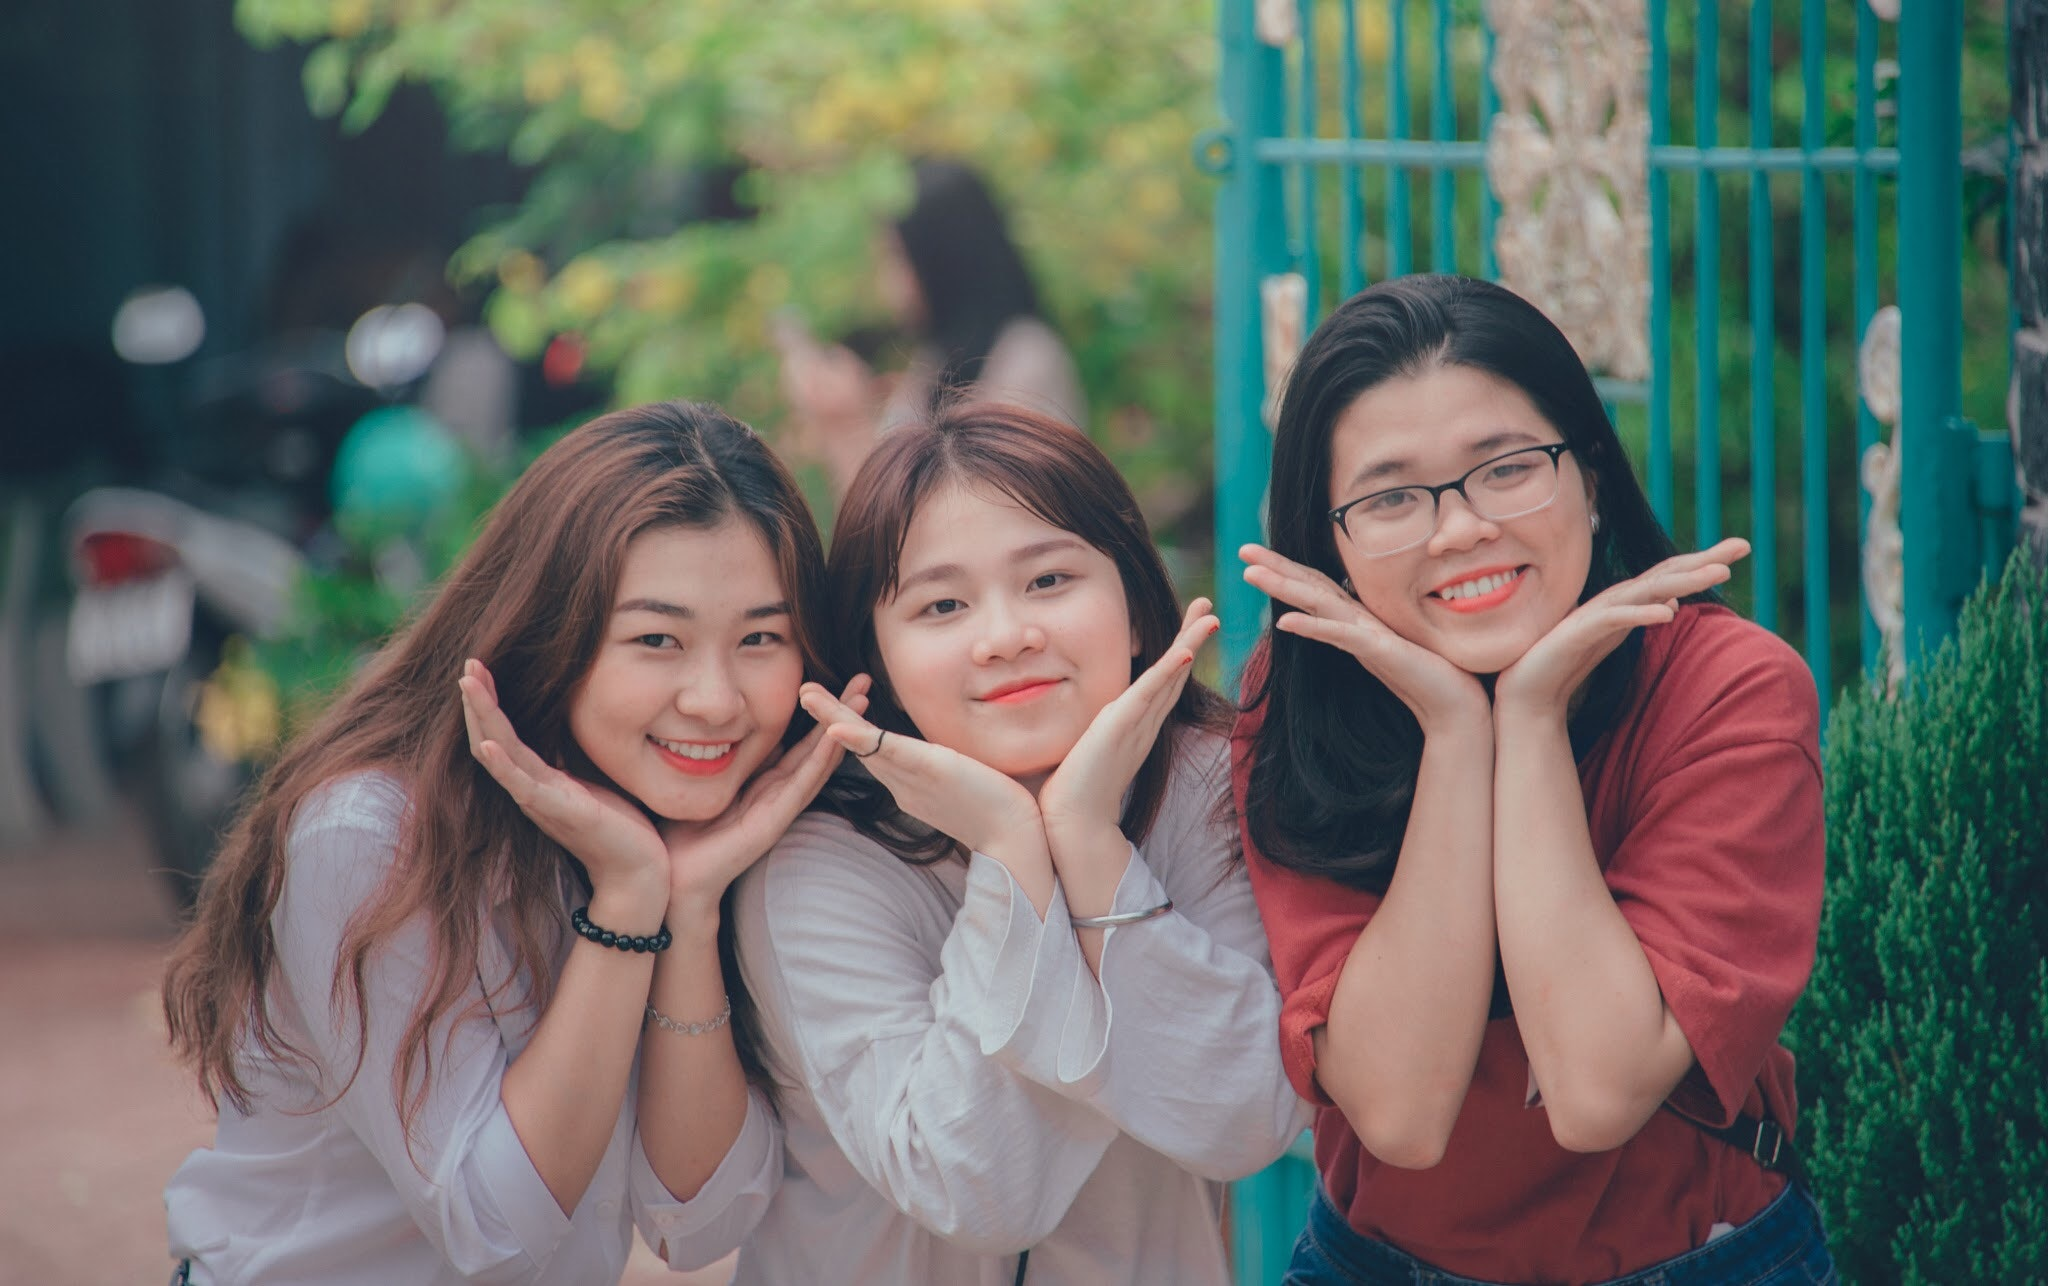 Three girl's wearing white and red dress shirts photo